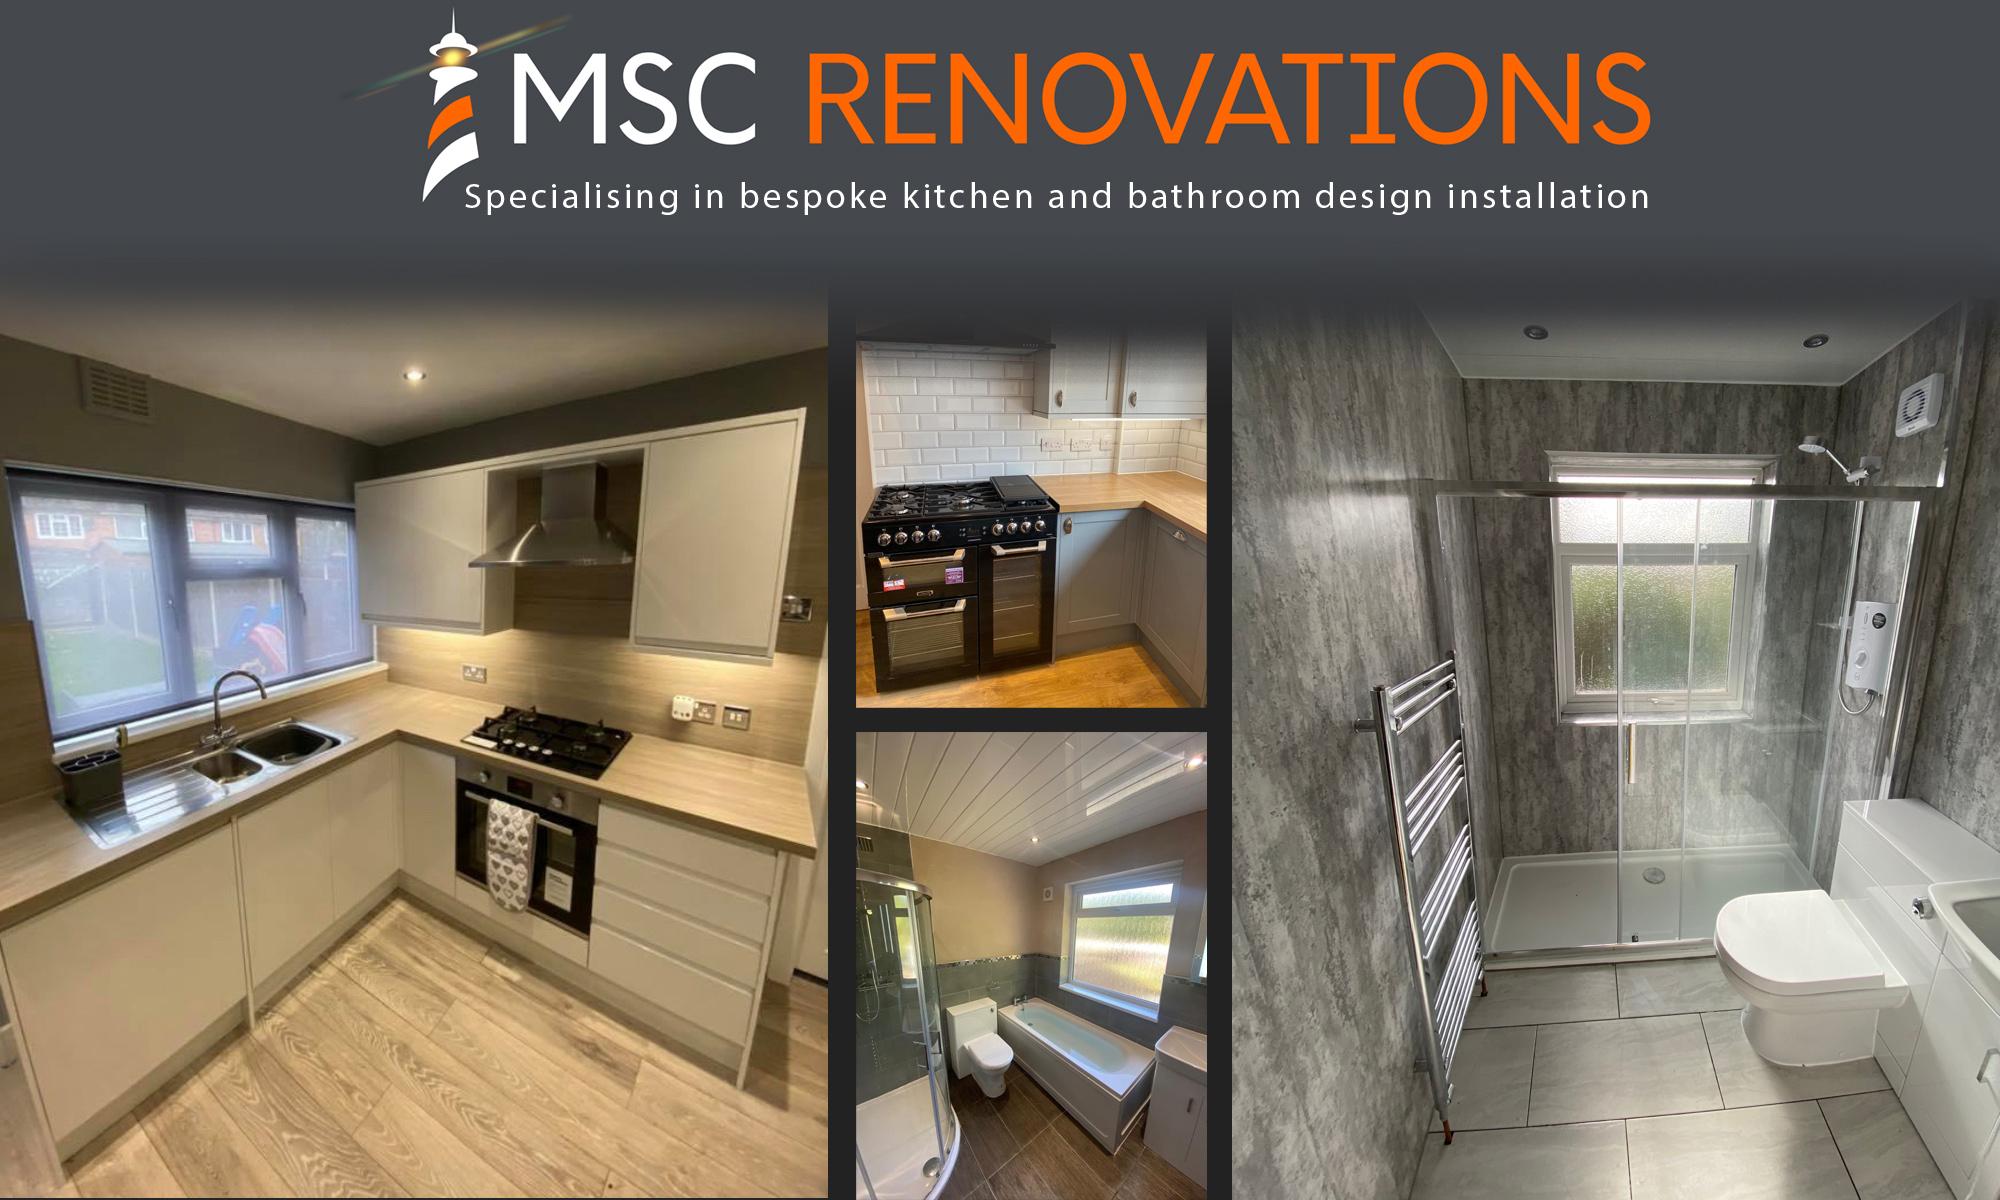 MSC Renovations